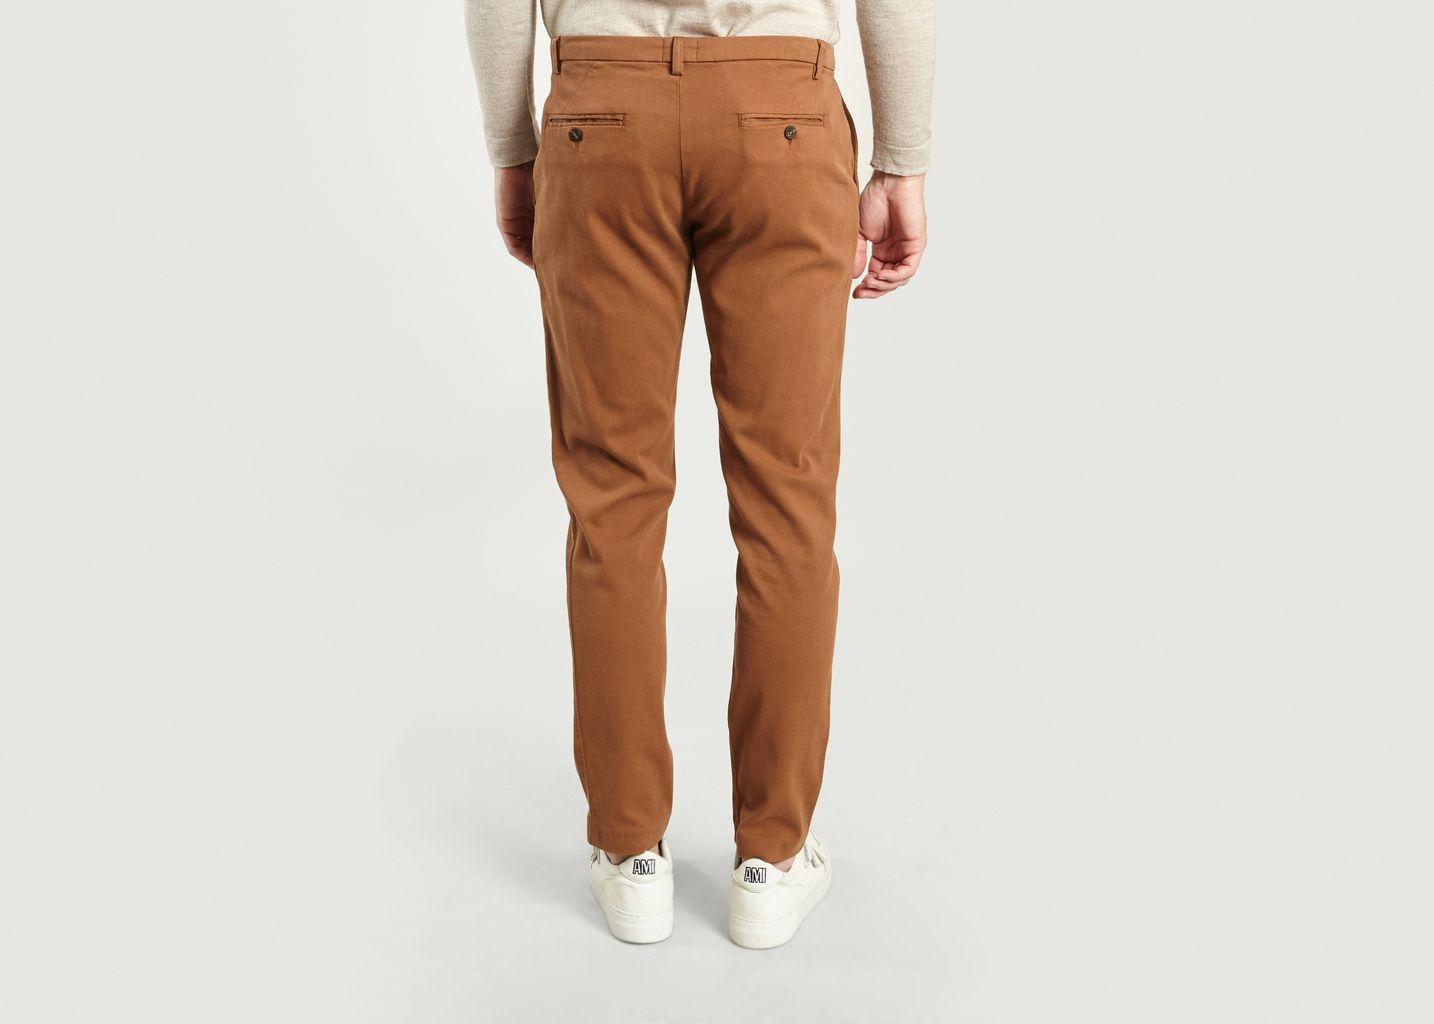 Pantalon City 1 - JagVi